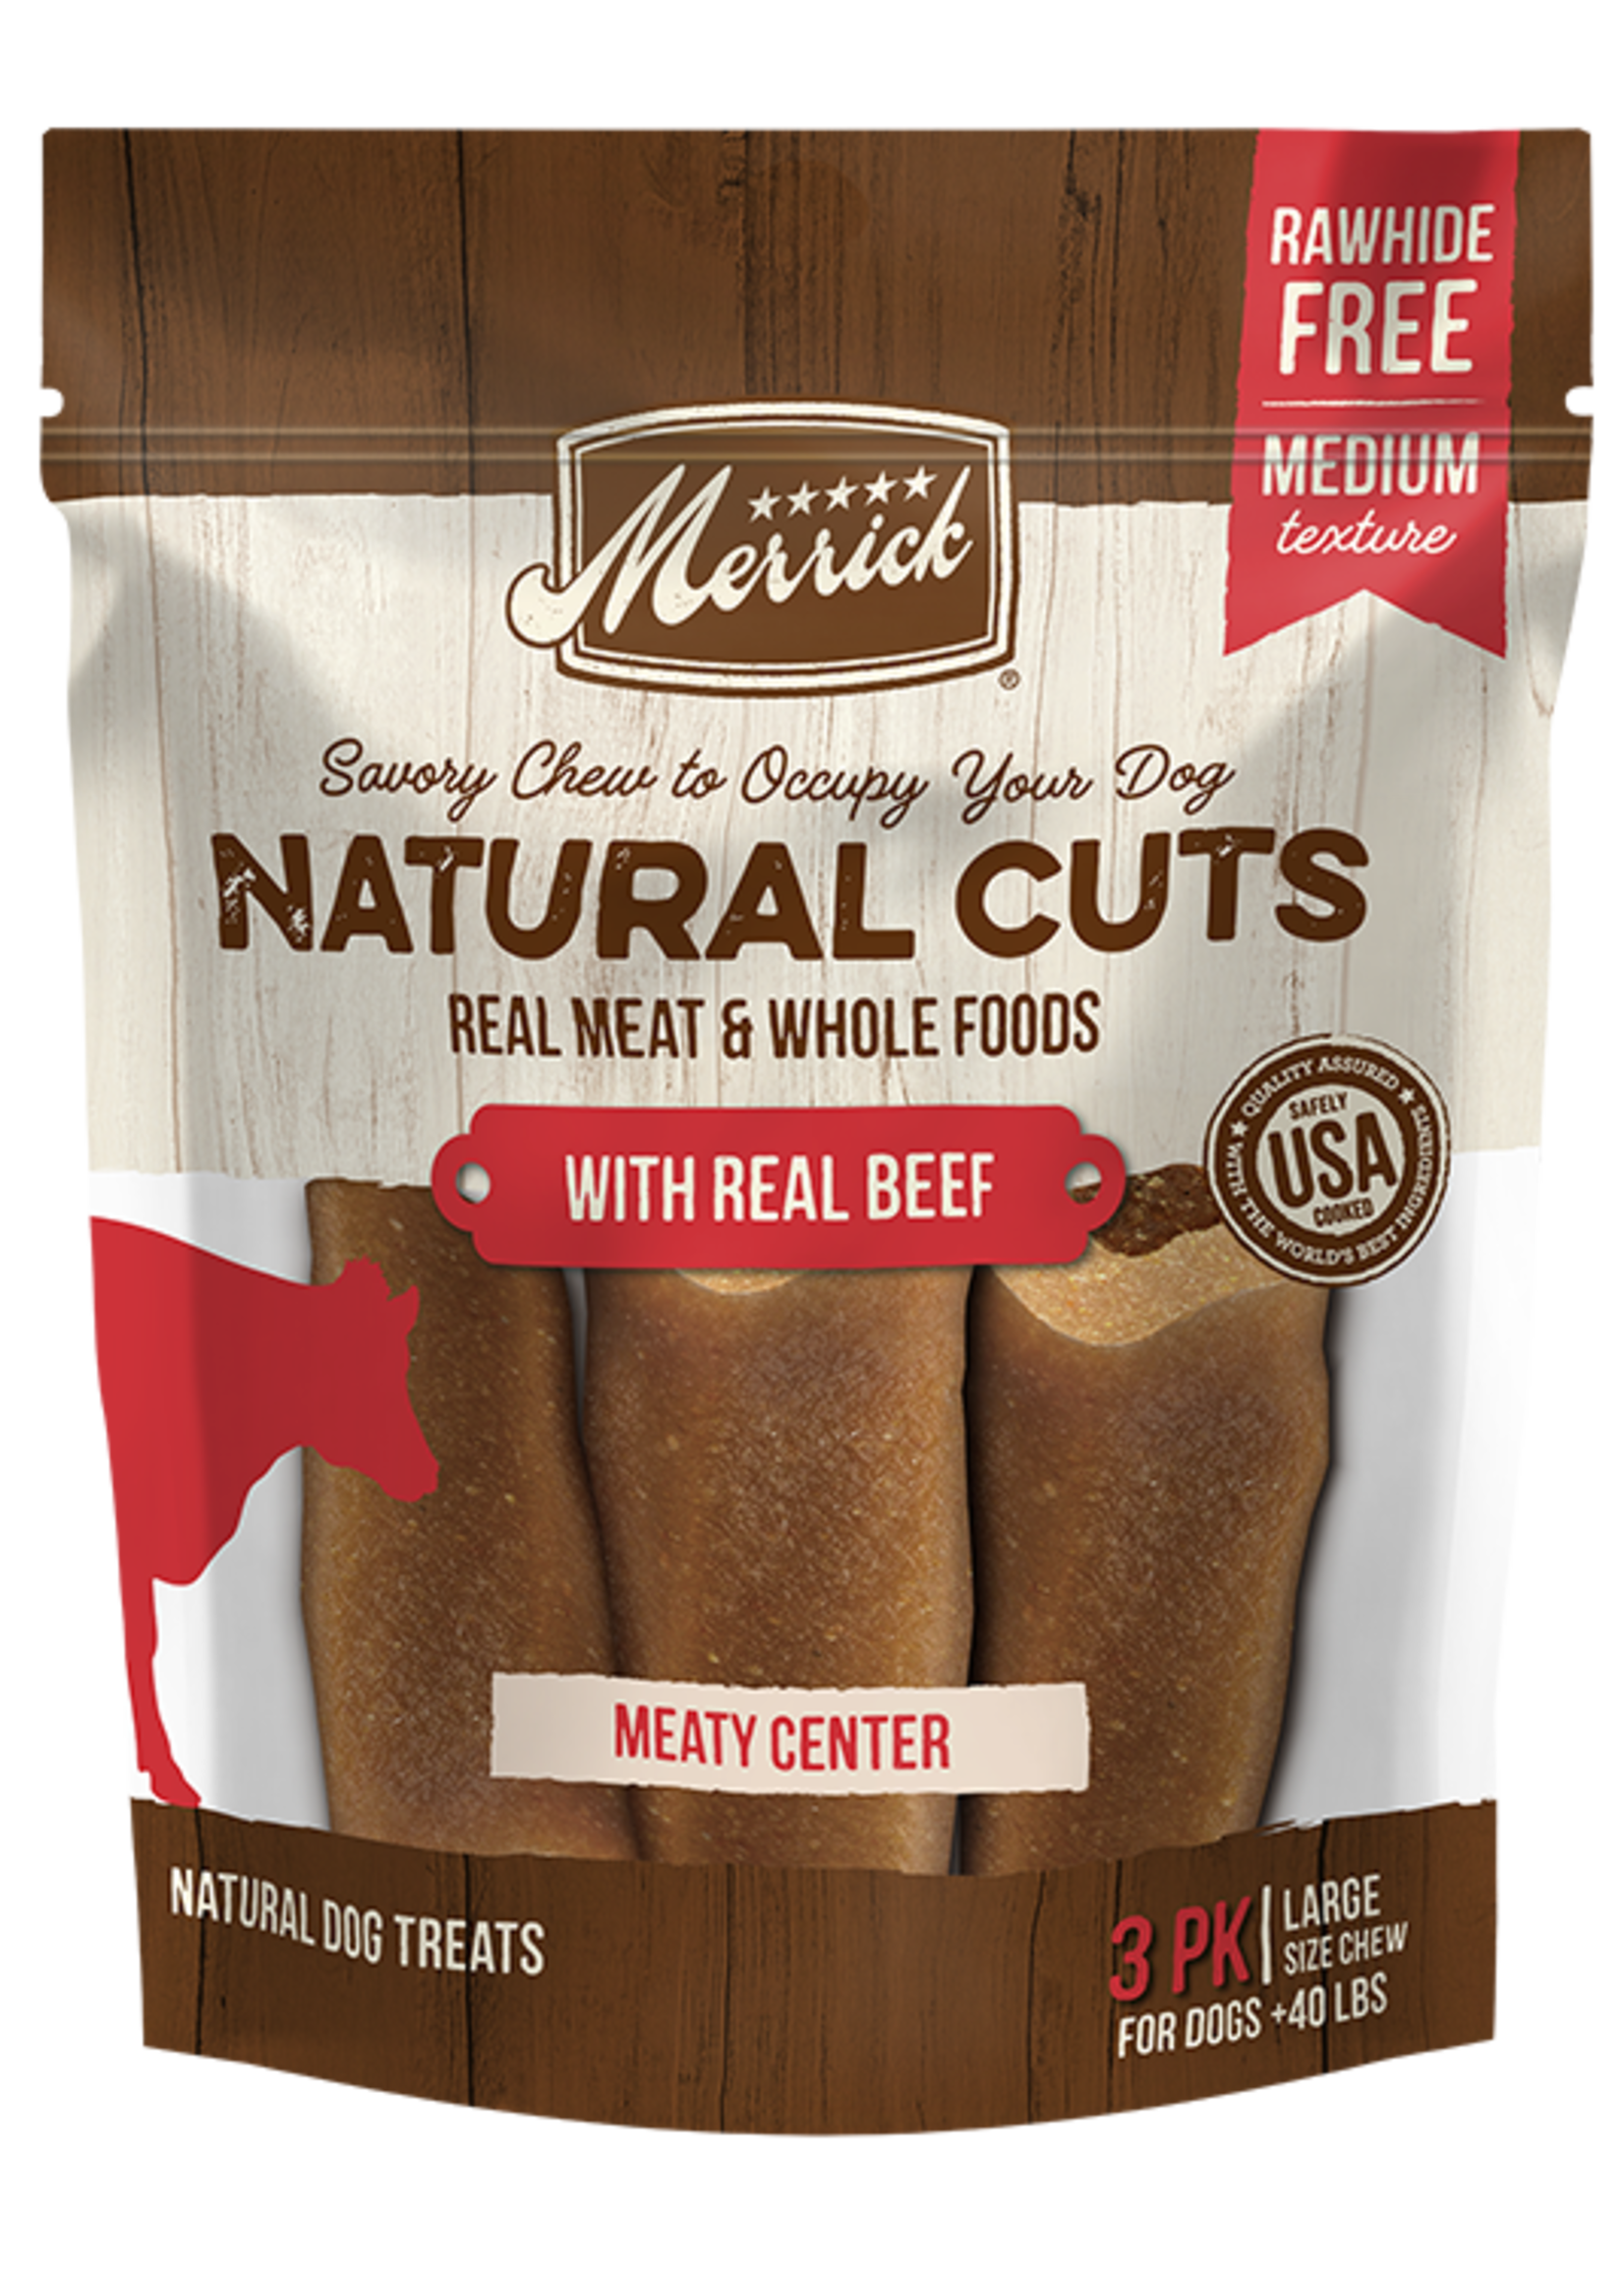 Merrick Merrick Natural Cuts w/ Beef Large 3 PK